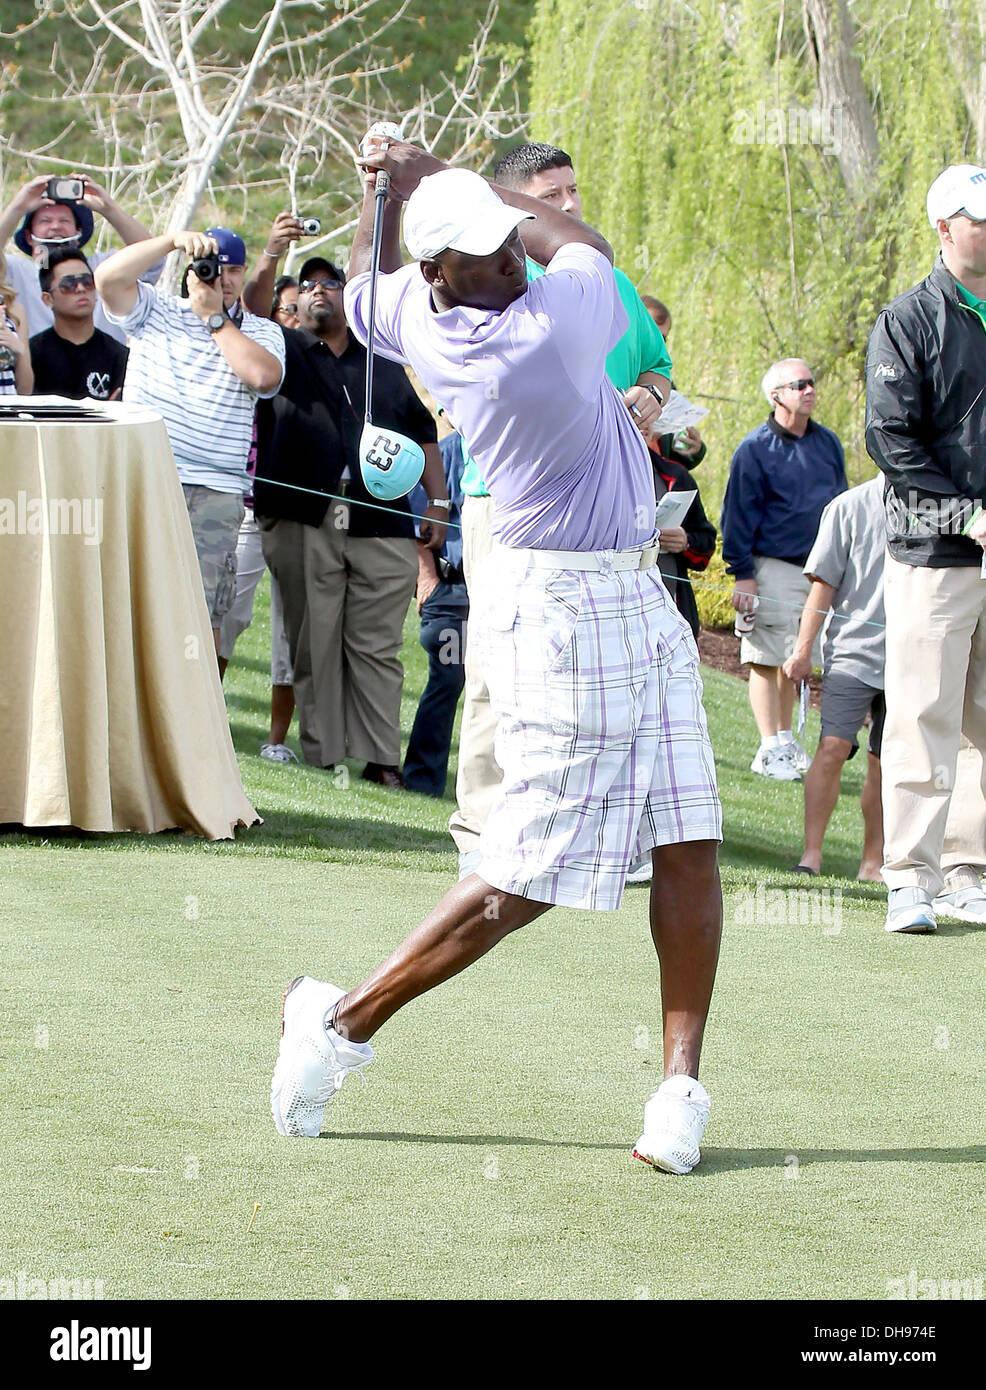 8401b2fb Michael Jordan 11th Annual Michael Jordan Celebrity Invitational Golf Event  hosted by Aria Resort & Casino and Shadow Creek Las